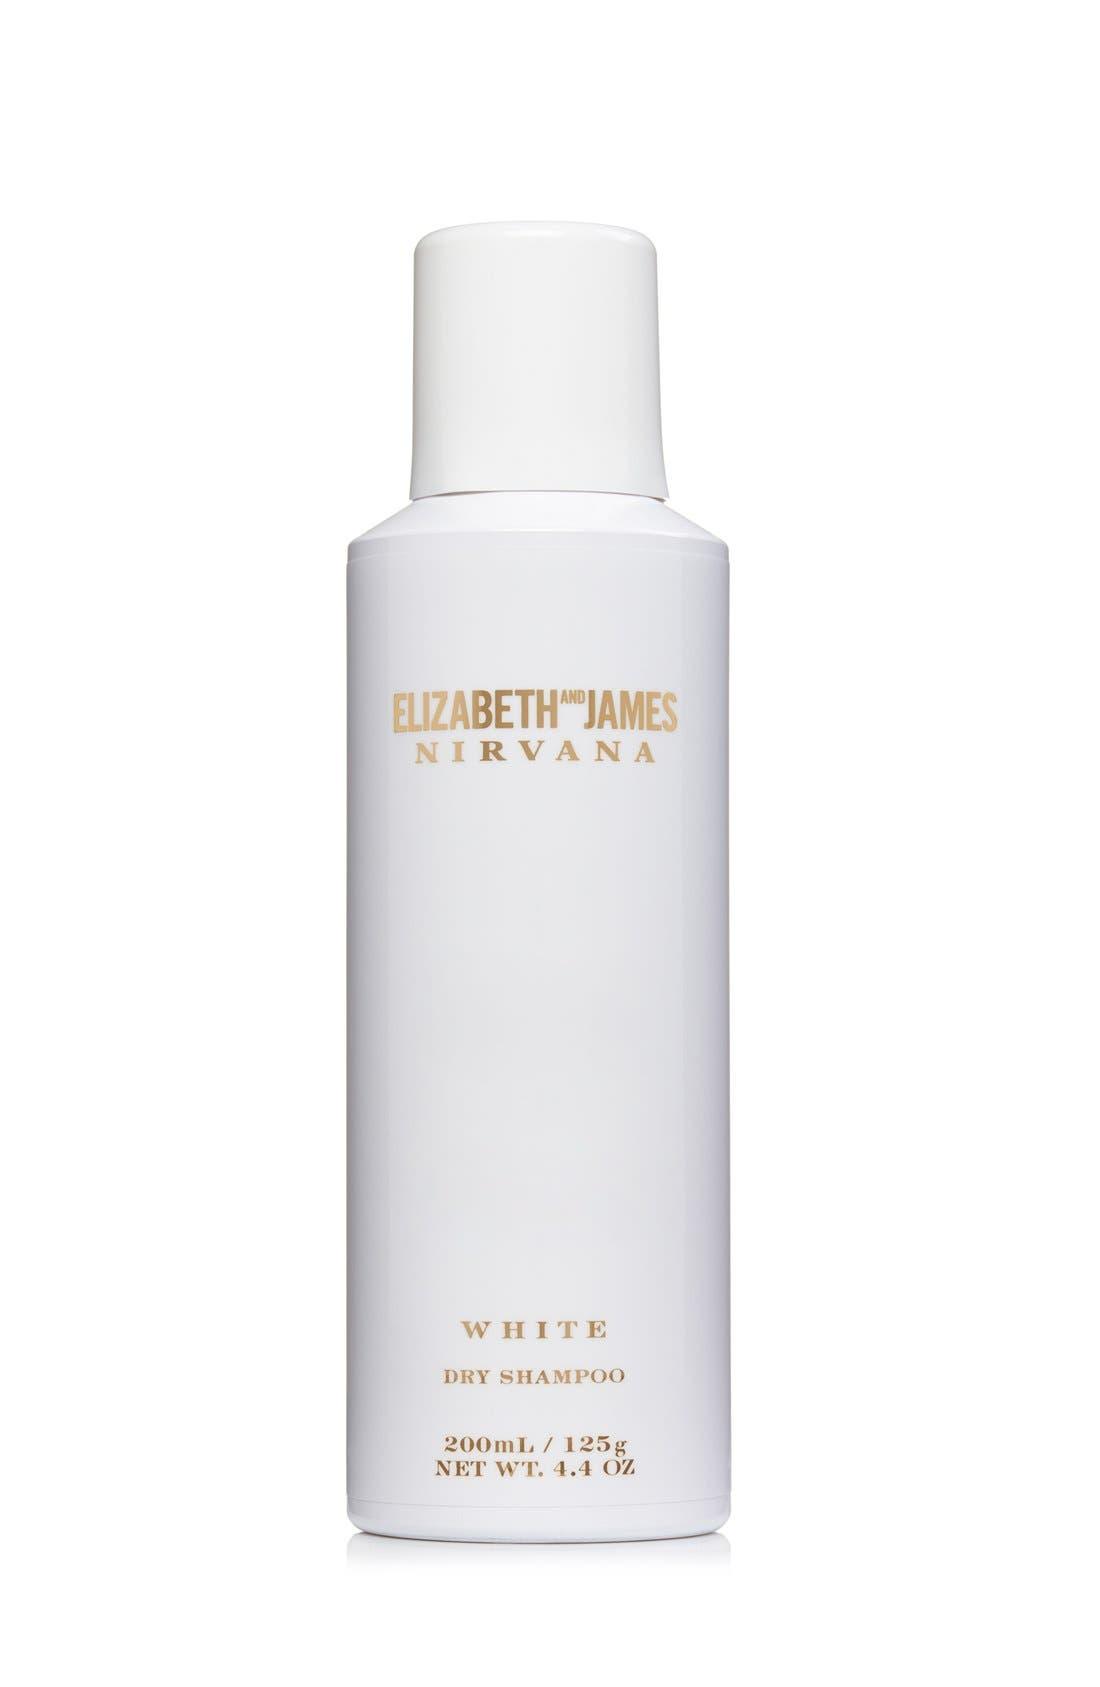 Elizabeth and James Nirvana White Dry Shampoo